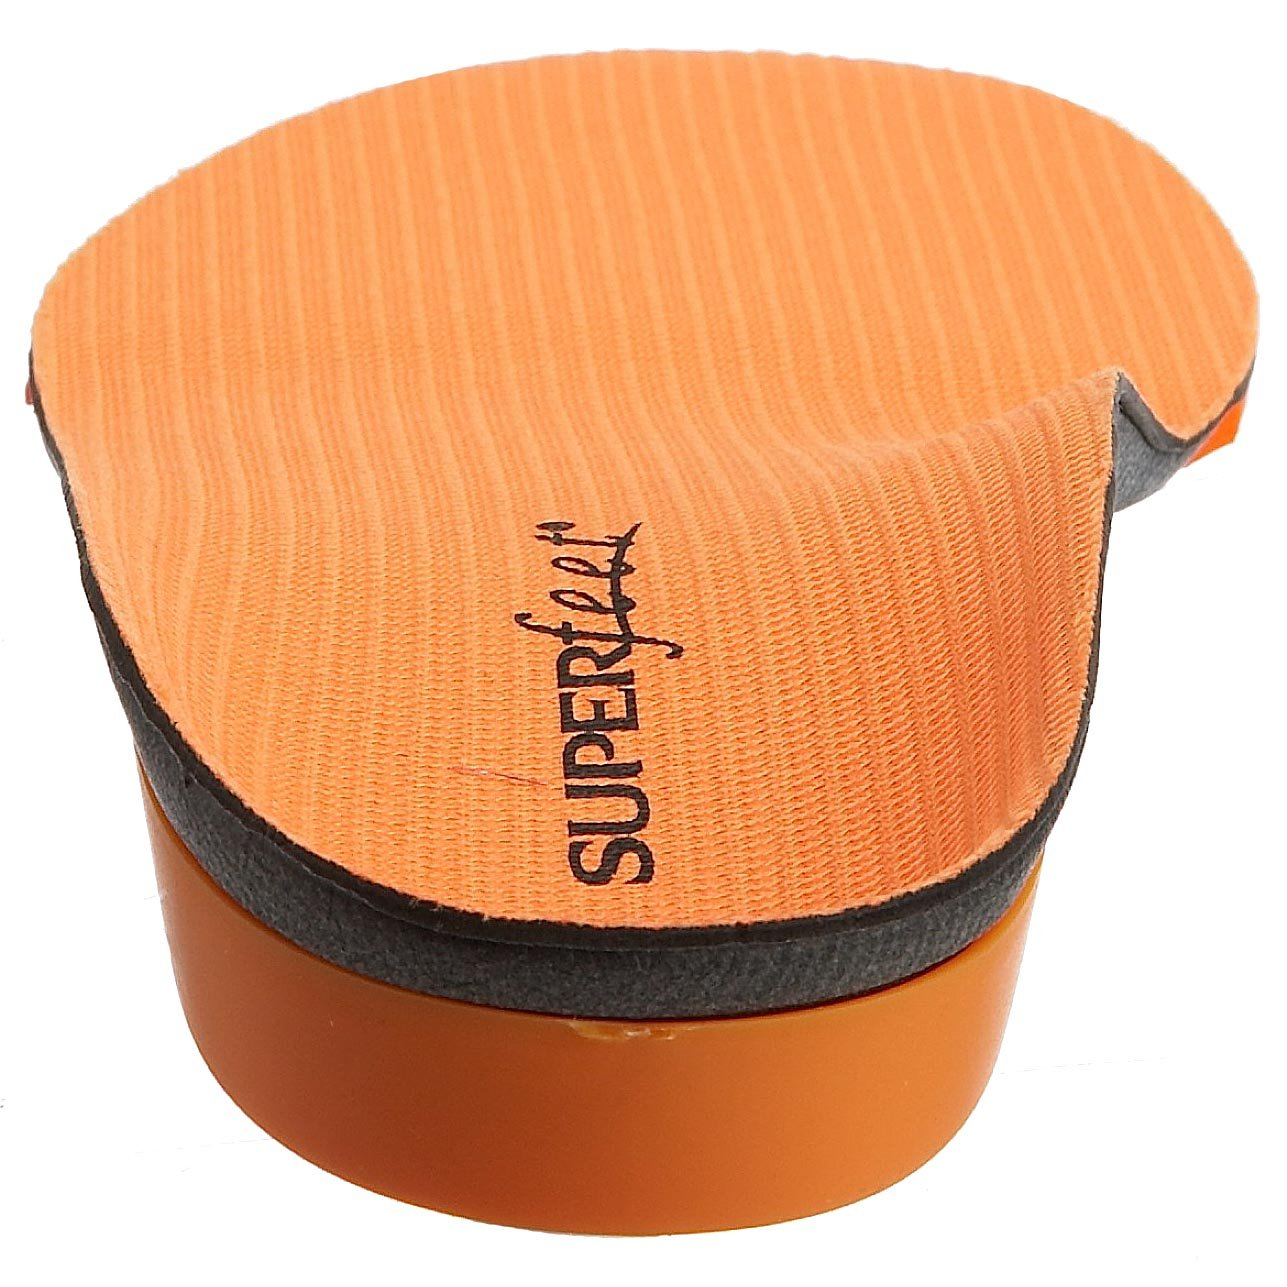 Superfeet Men's Orange Premium Insoles,Orange,C: 5.5-7 US Mens by Superfeet (Image #2)